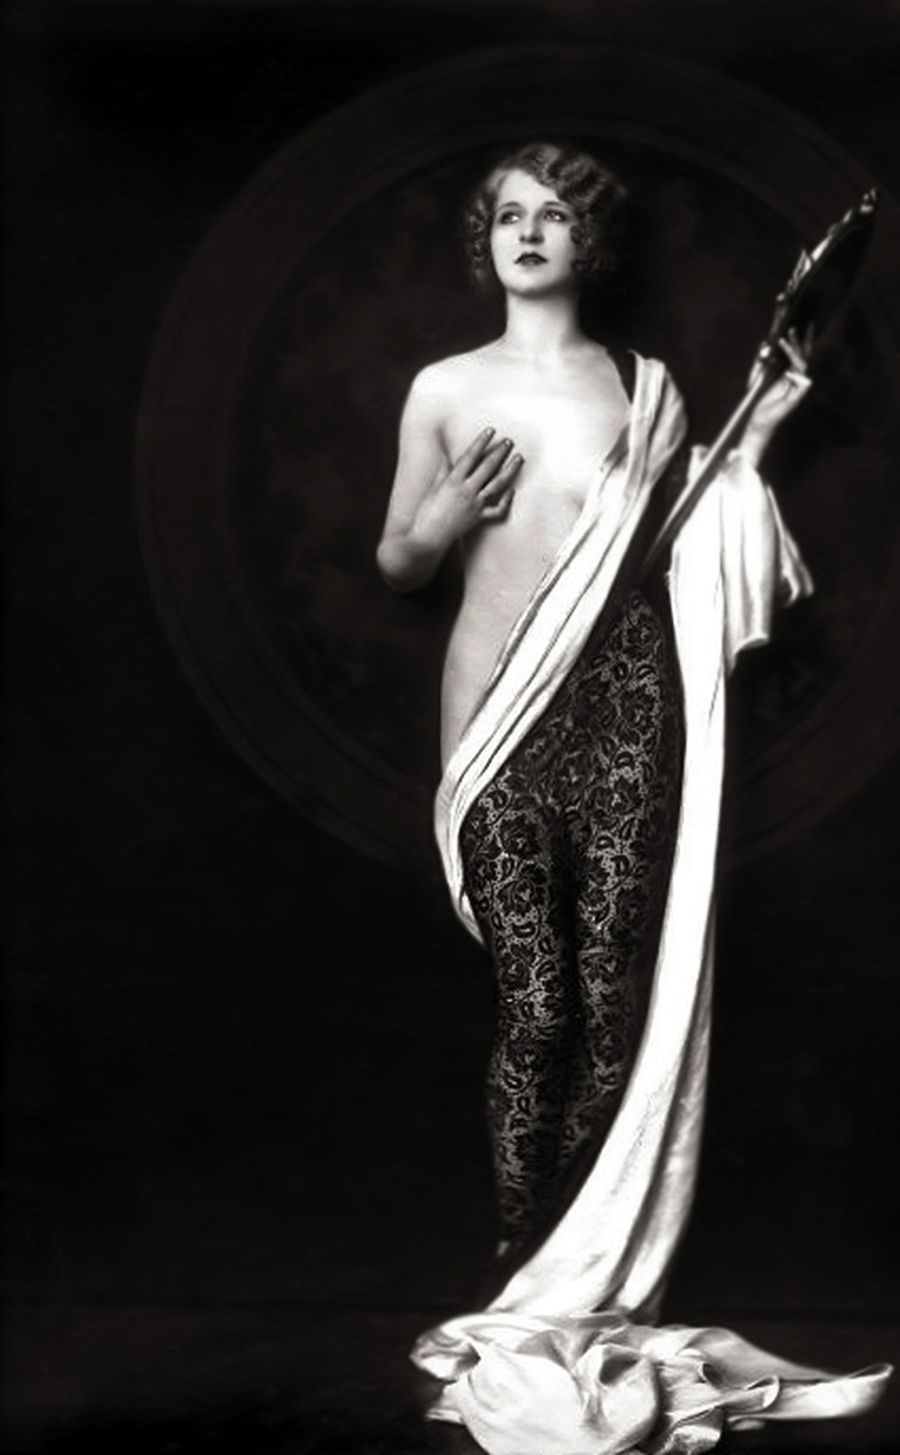 Alfred Cheney Johnston-The Ziegfeld Follies en 2020